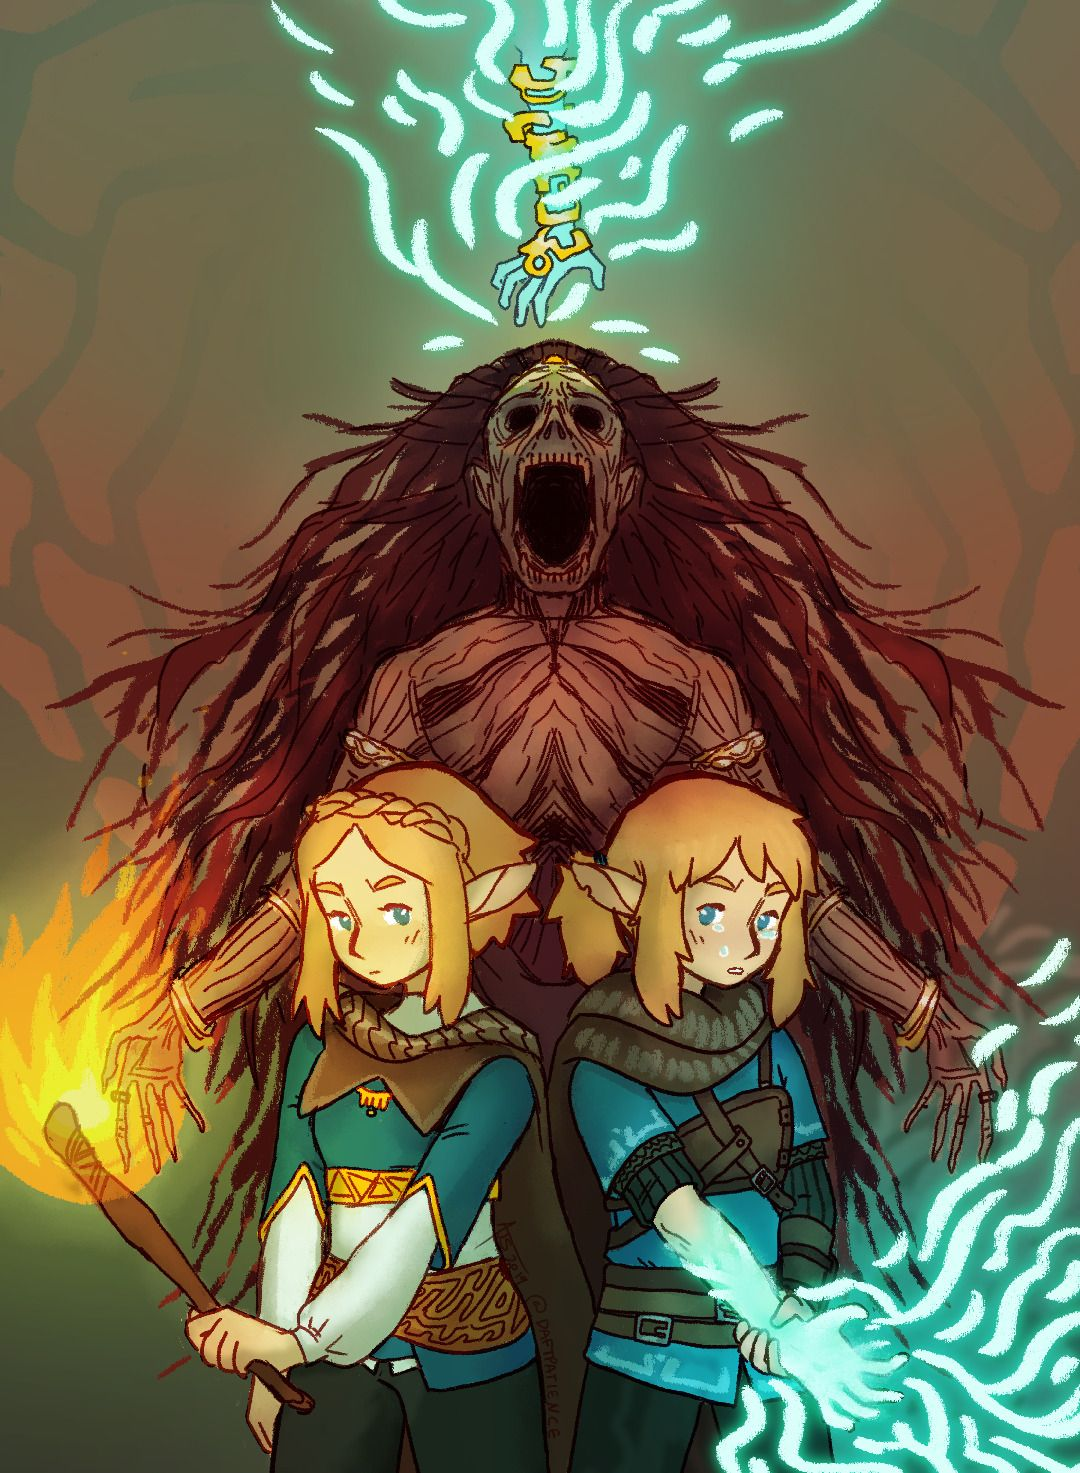 Legend Of Zelda Breath Of The Wild Sequel Art Botw 2 Sfusummerfestival By Daftpatience Legend Of Zelda Legend Of Zelda Breath Botw 2